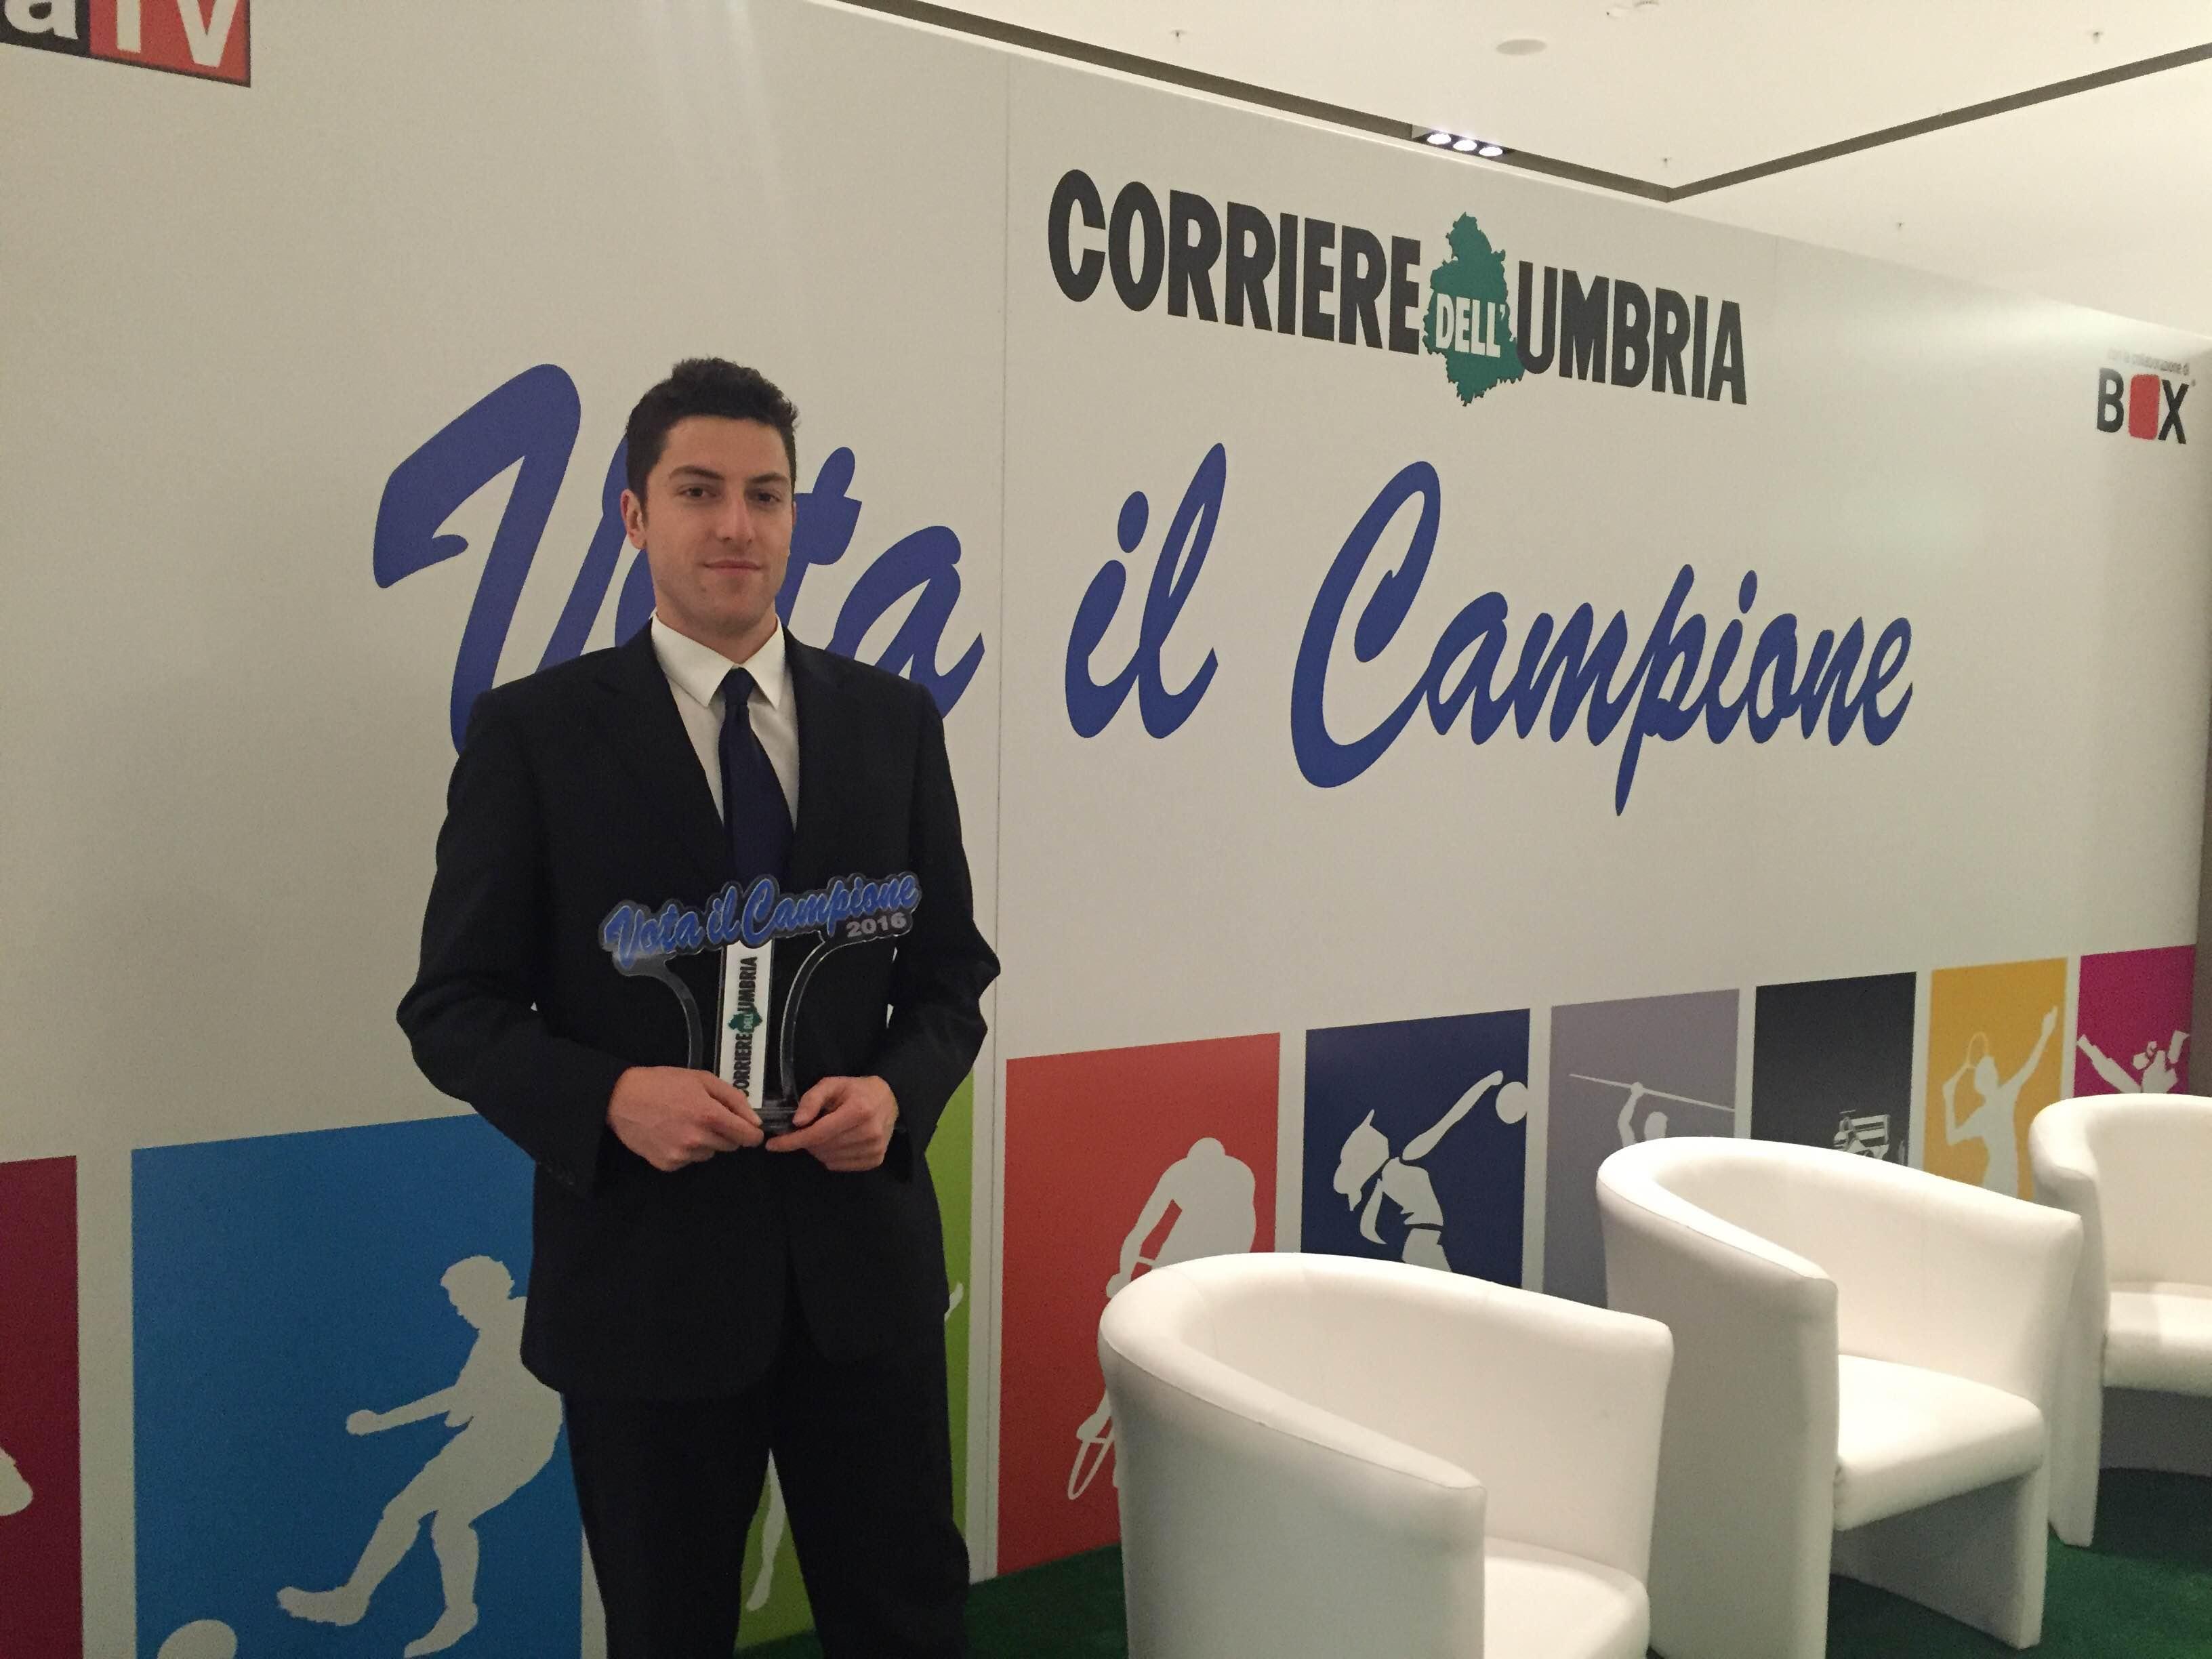 RiccardoMarchionni VotaCampione2